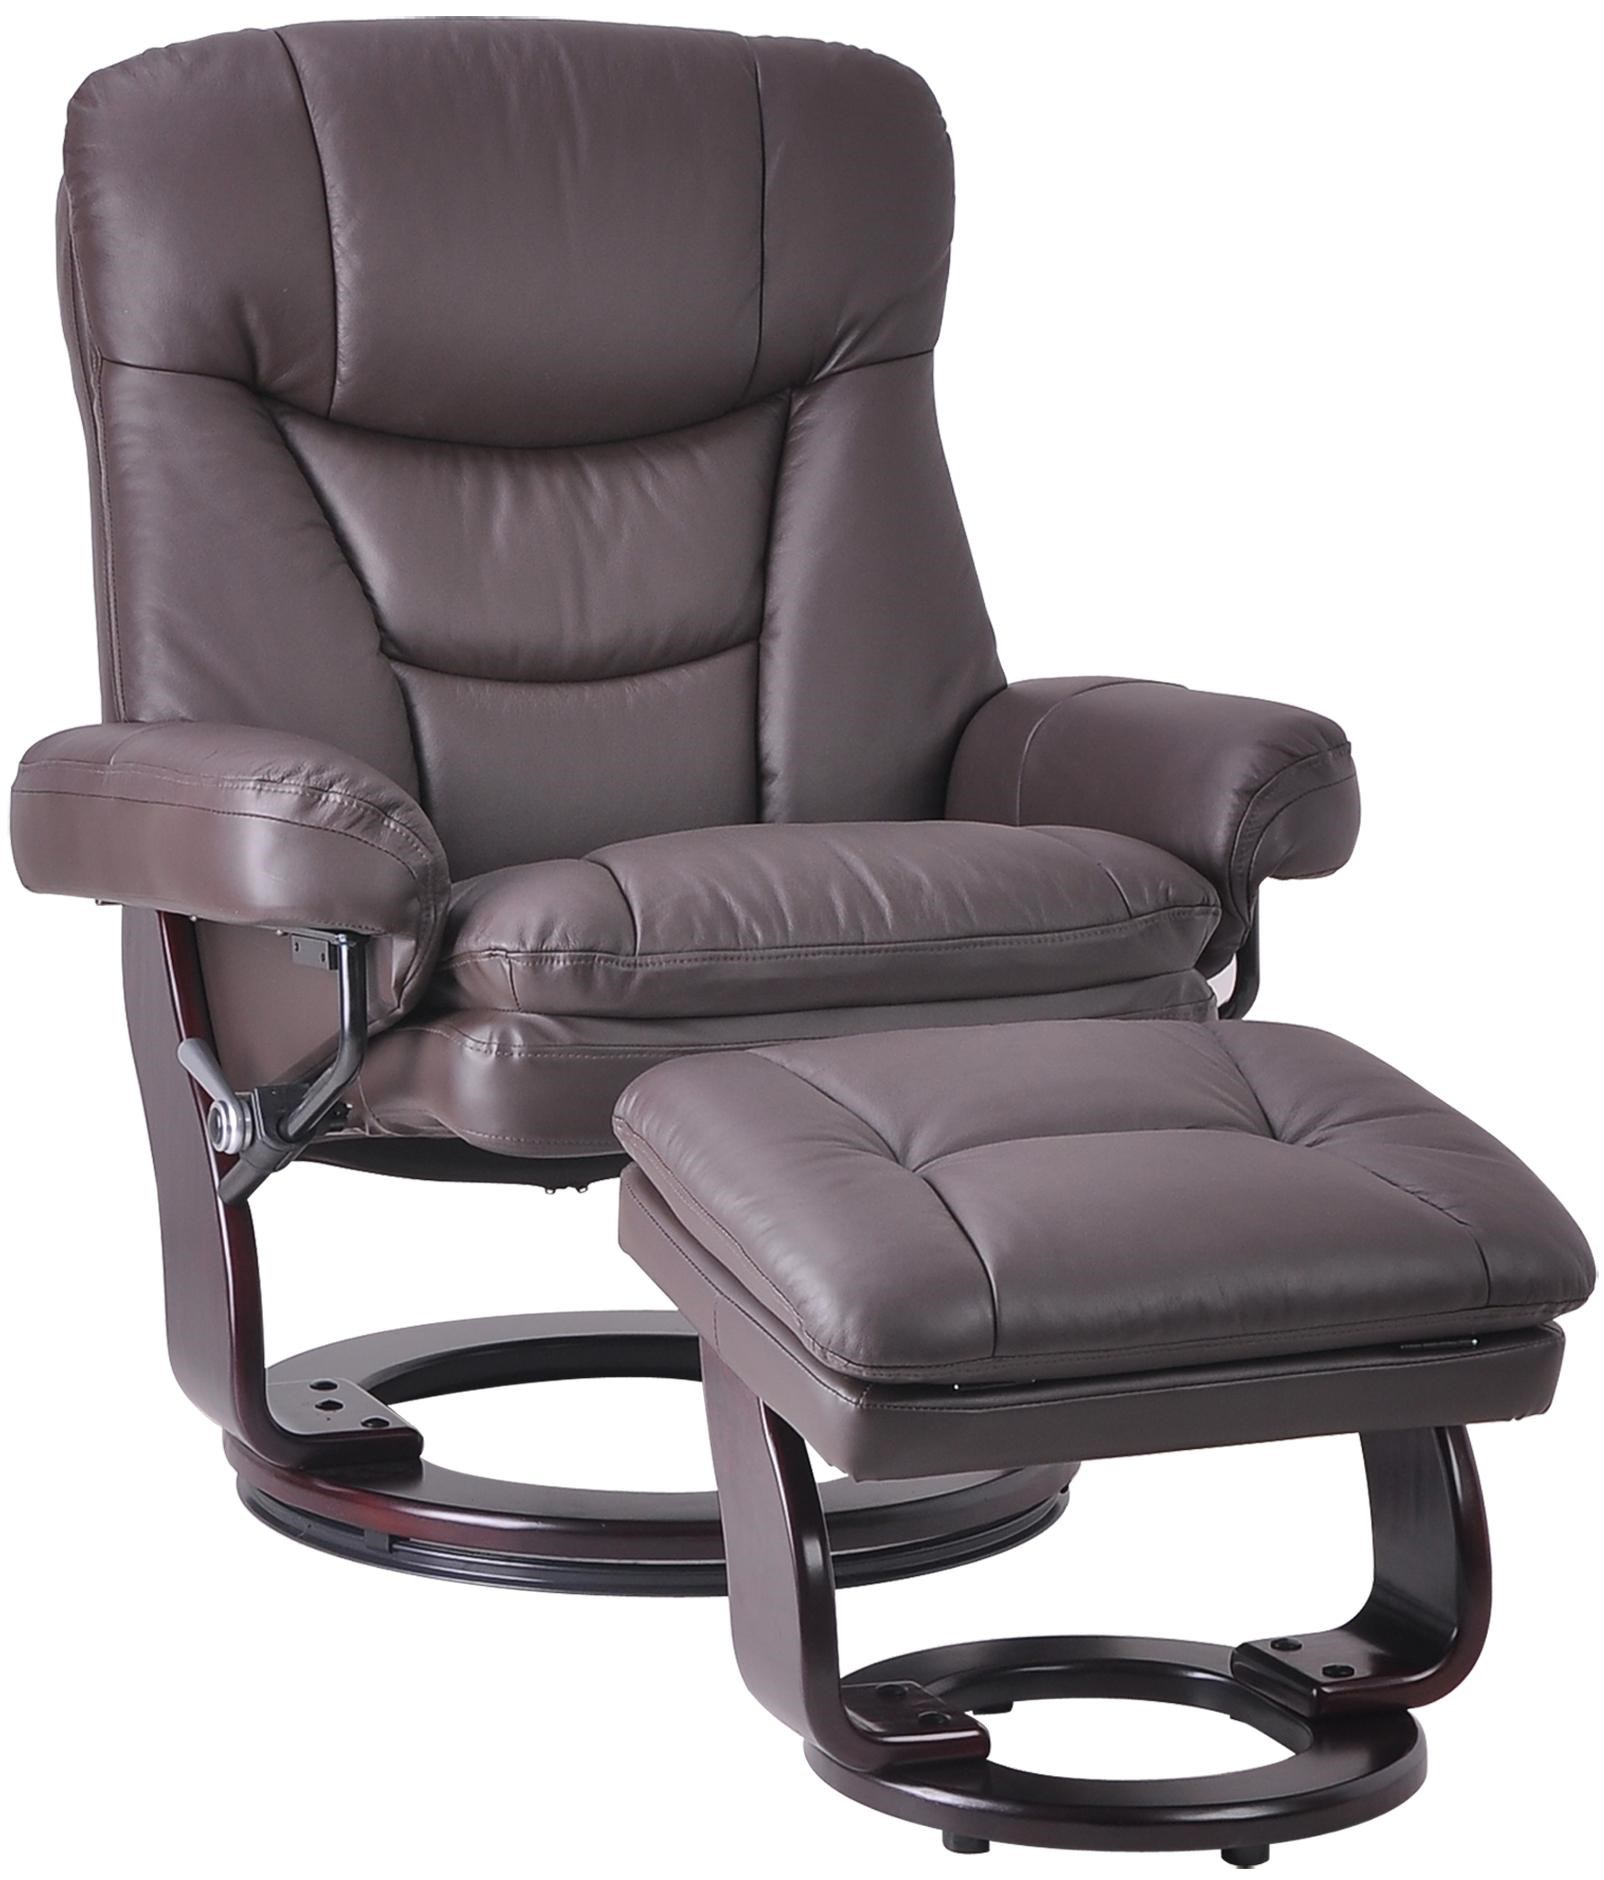 reclining chair ottoman sets